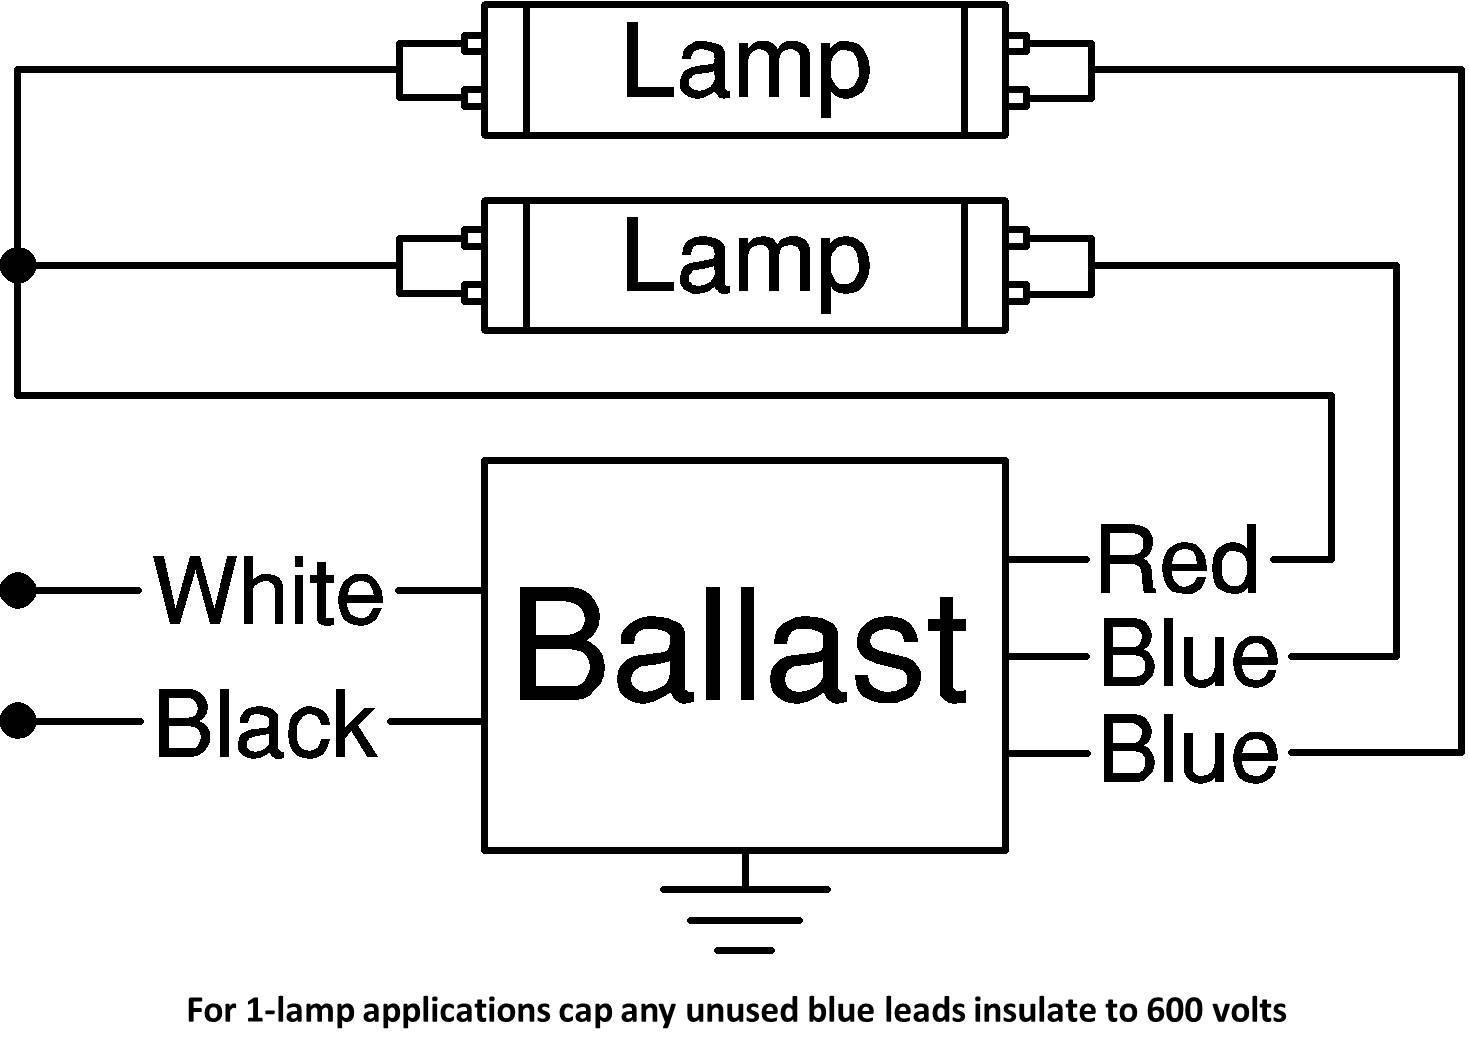 m57 ballast wiring diagram wiring diagram services u2022 rh openairpublishing com T8 Ballast Wiring Diagram Bodine Emergency Ballast Wiring Diagram